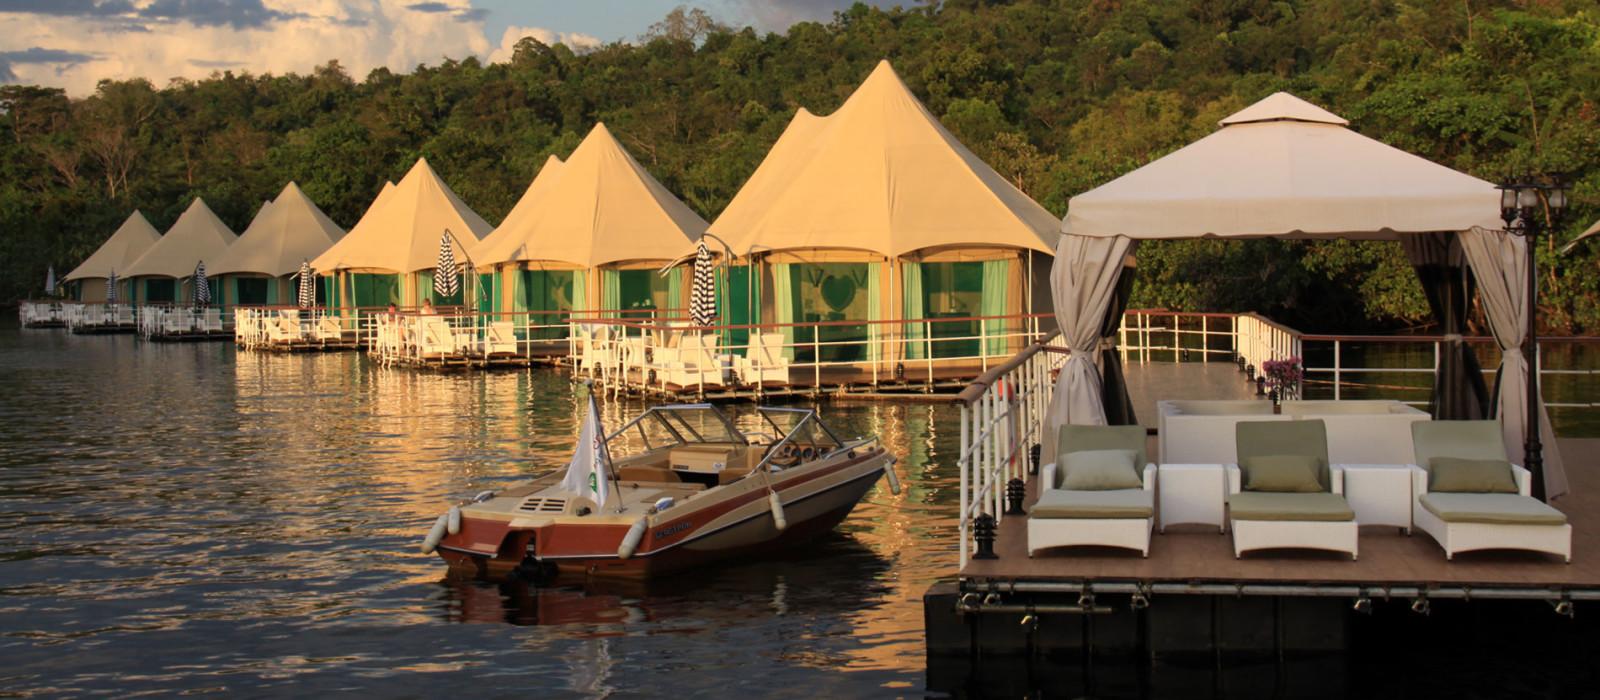 Hotel 4 Rivers Floating Lodge Kambodscha